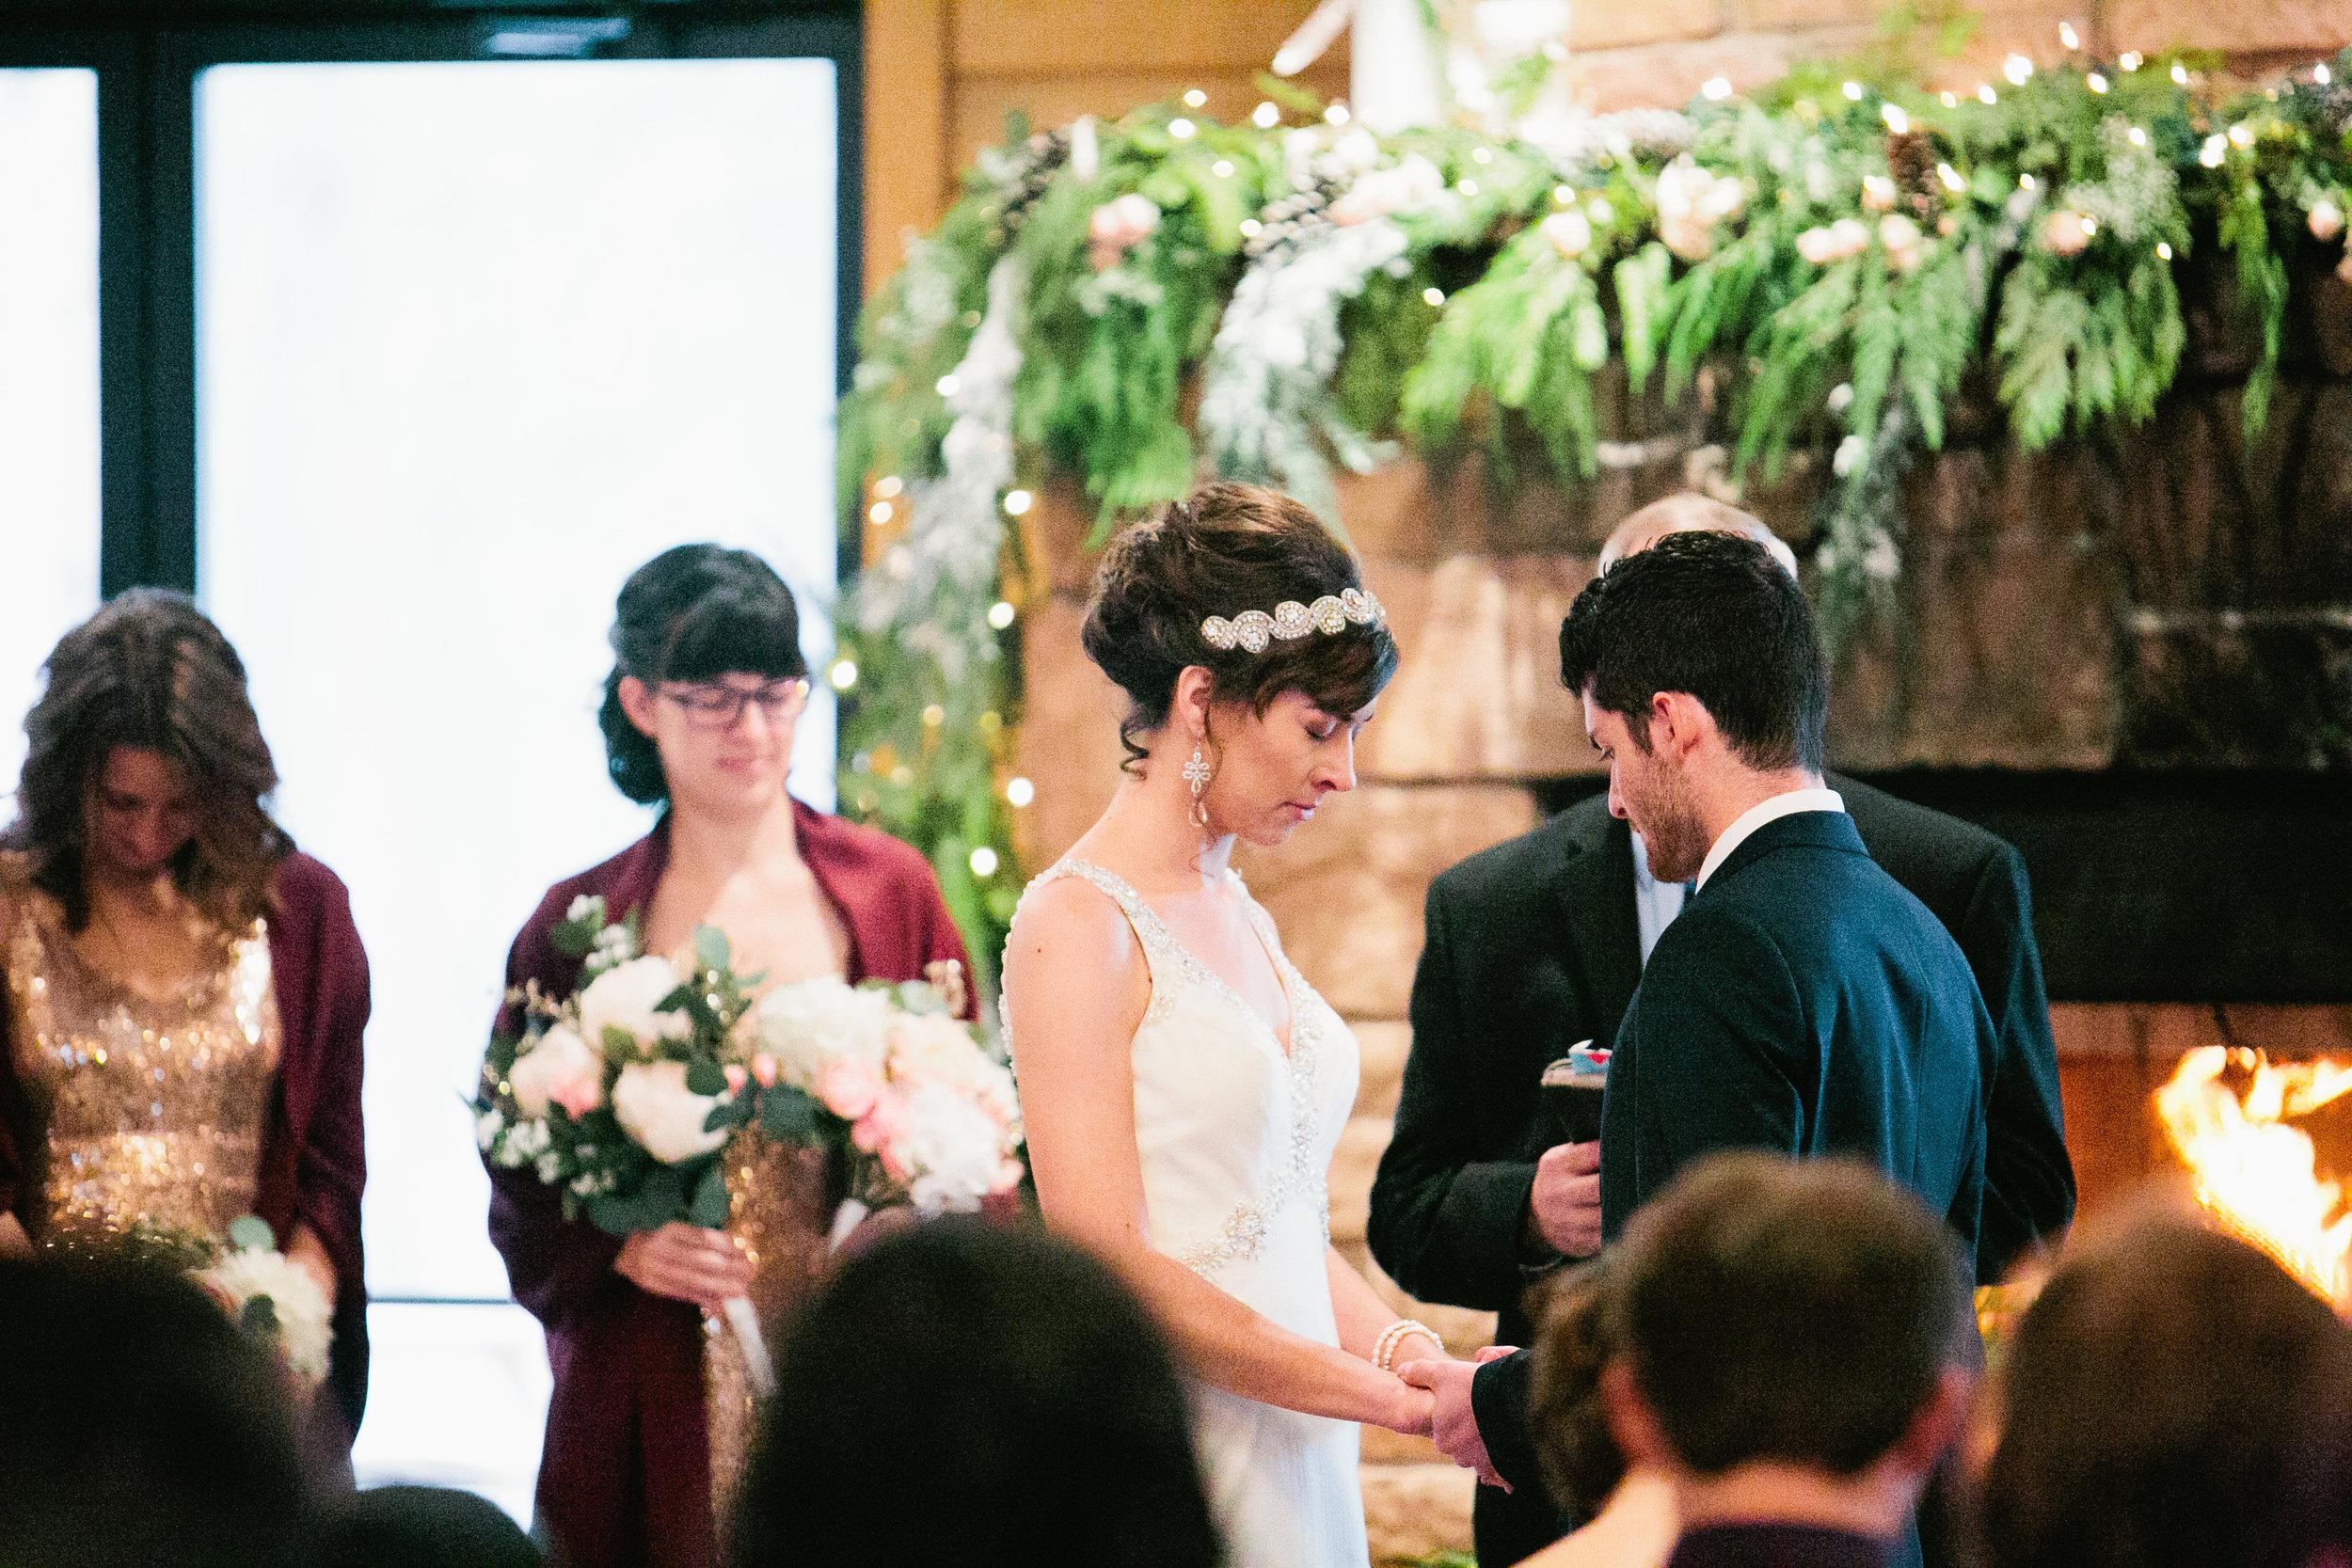 Kisler-wedding-186.jpg